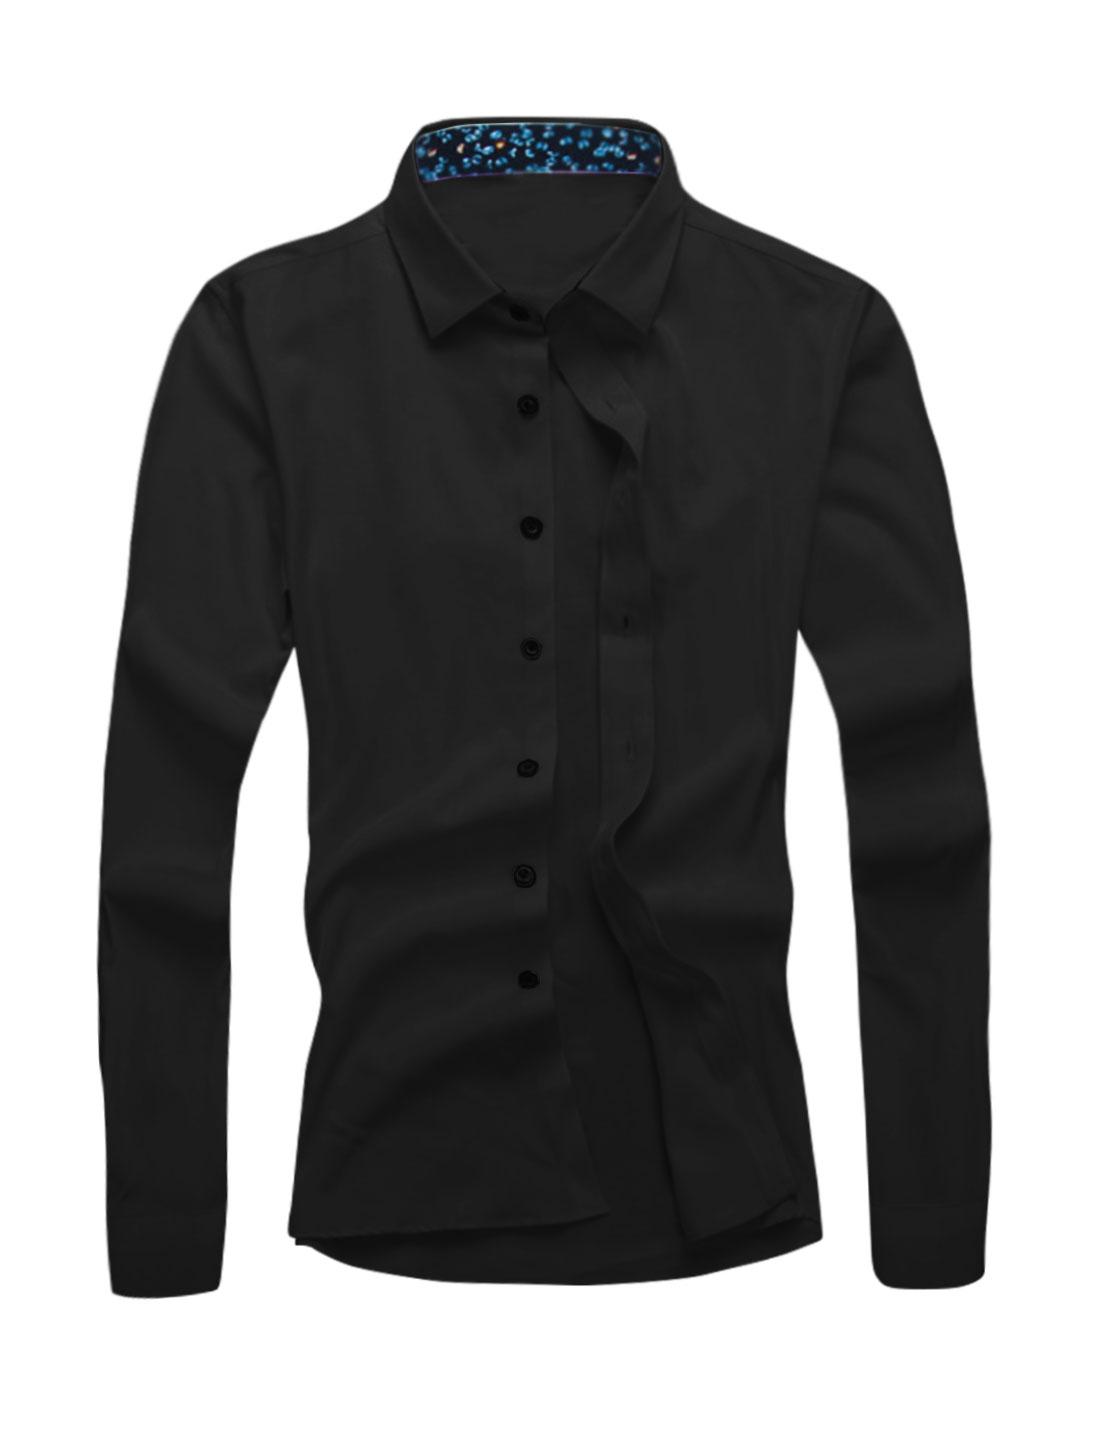 Men Point Collar Long Sleeves Single Breasted Slim Fit Shirt Black M